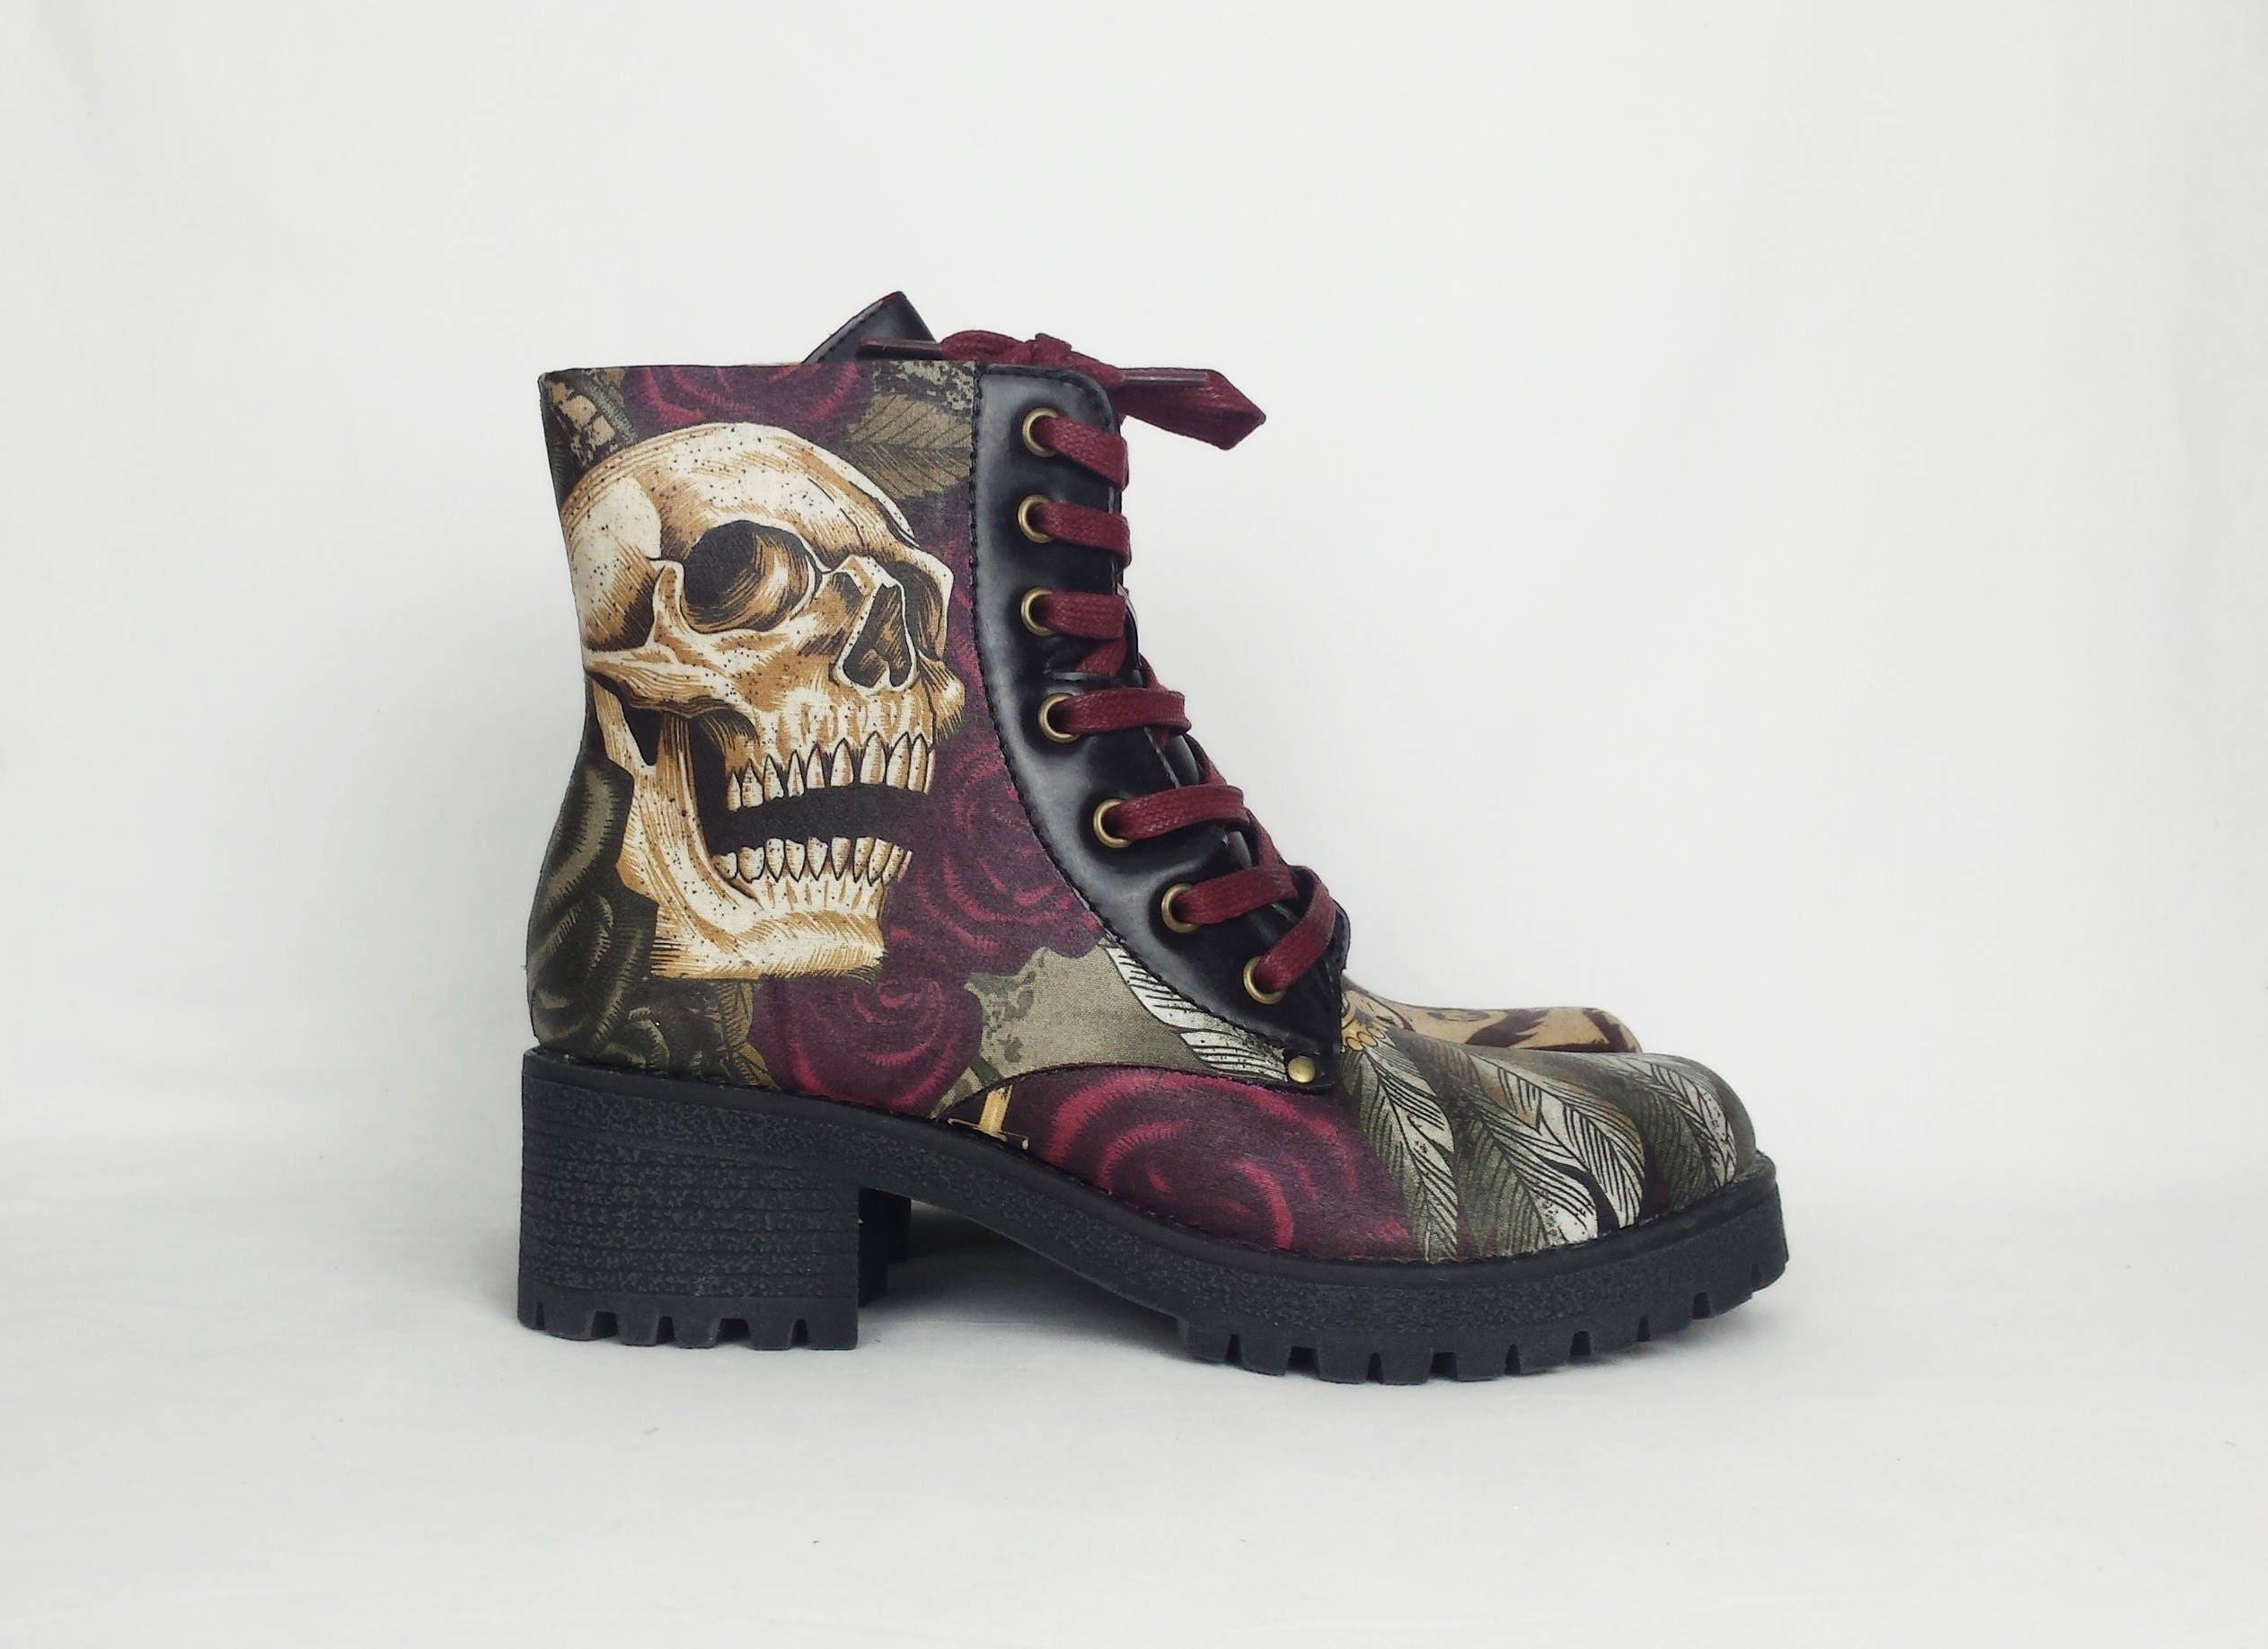 Punk Shoes Uk